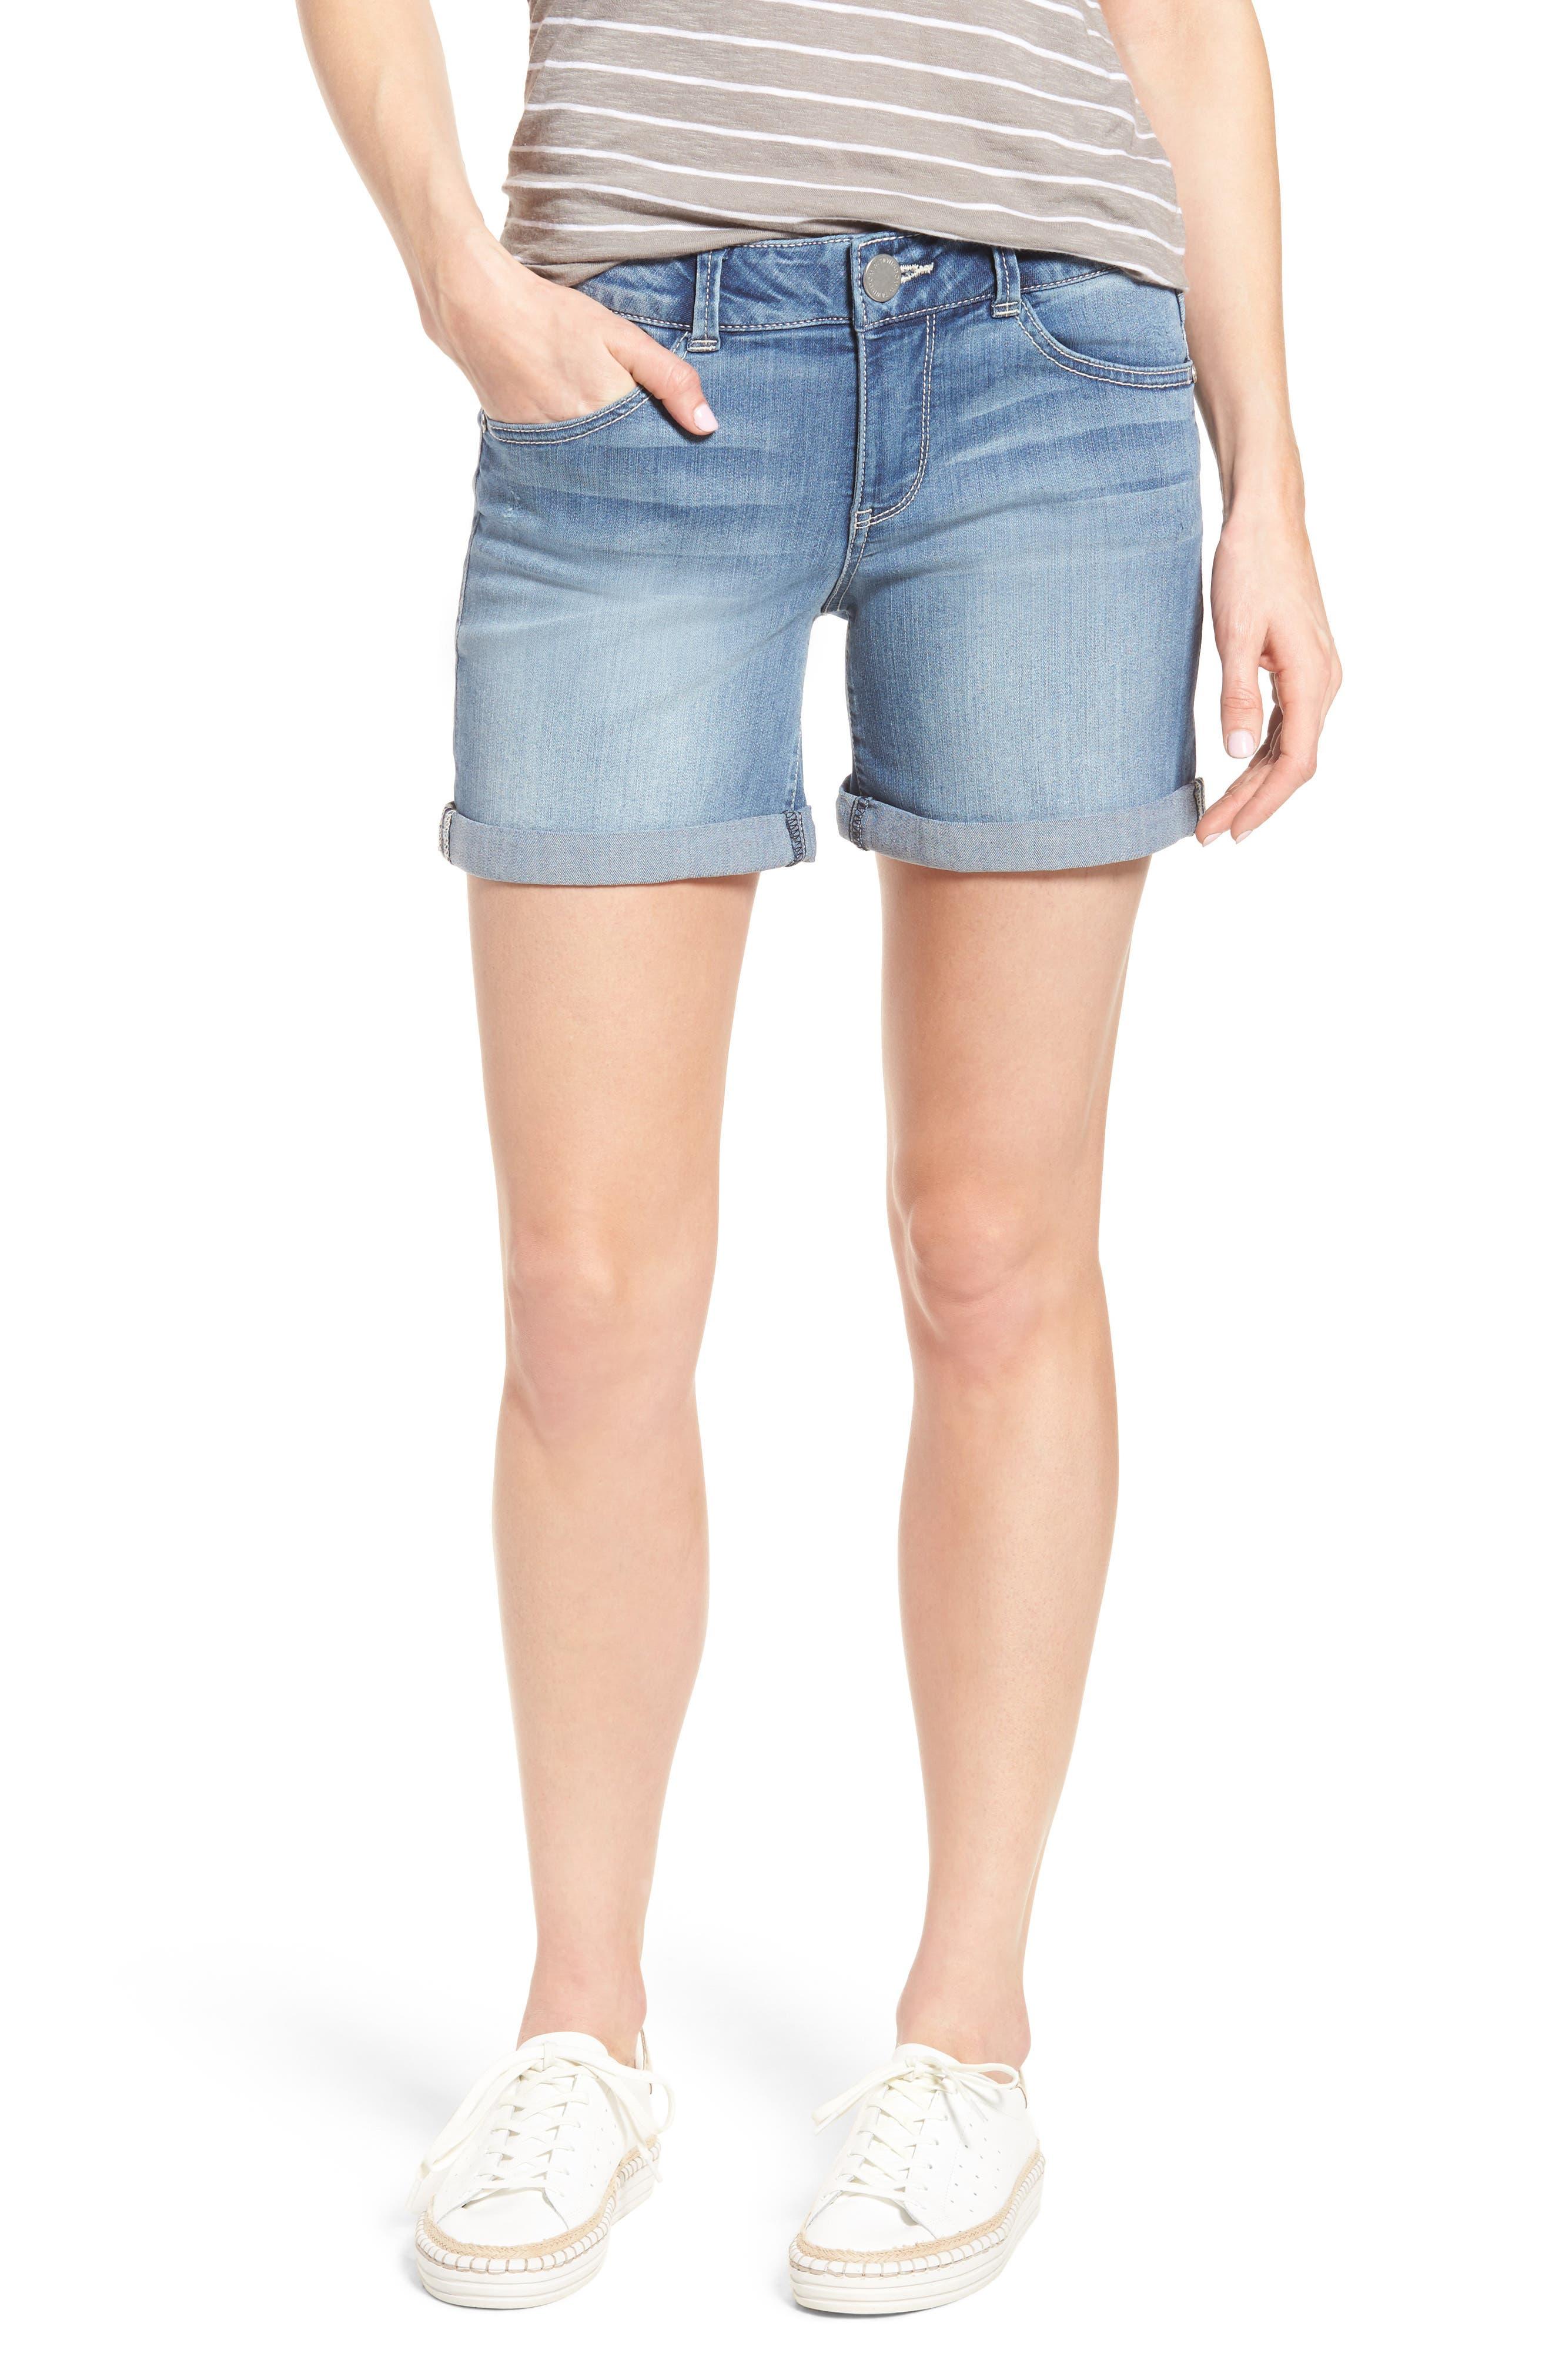 Ab-solution Cuffed Denim Shorts,                         Main,                         color, 458